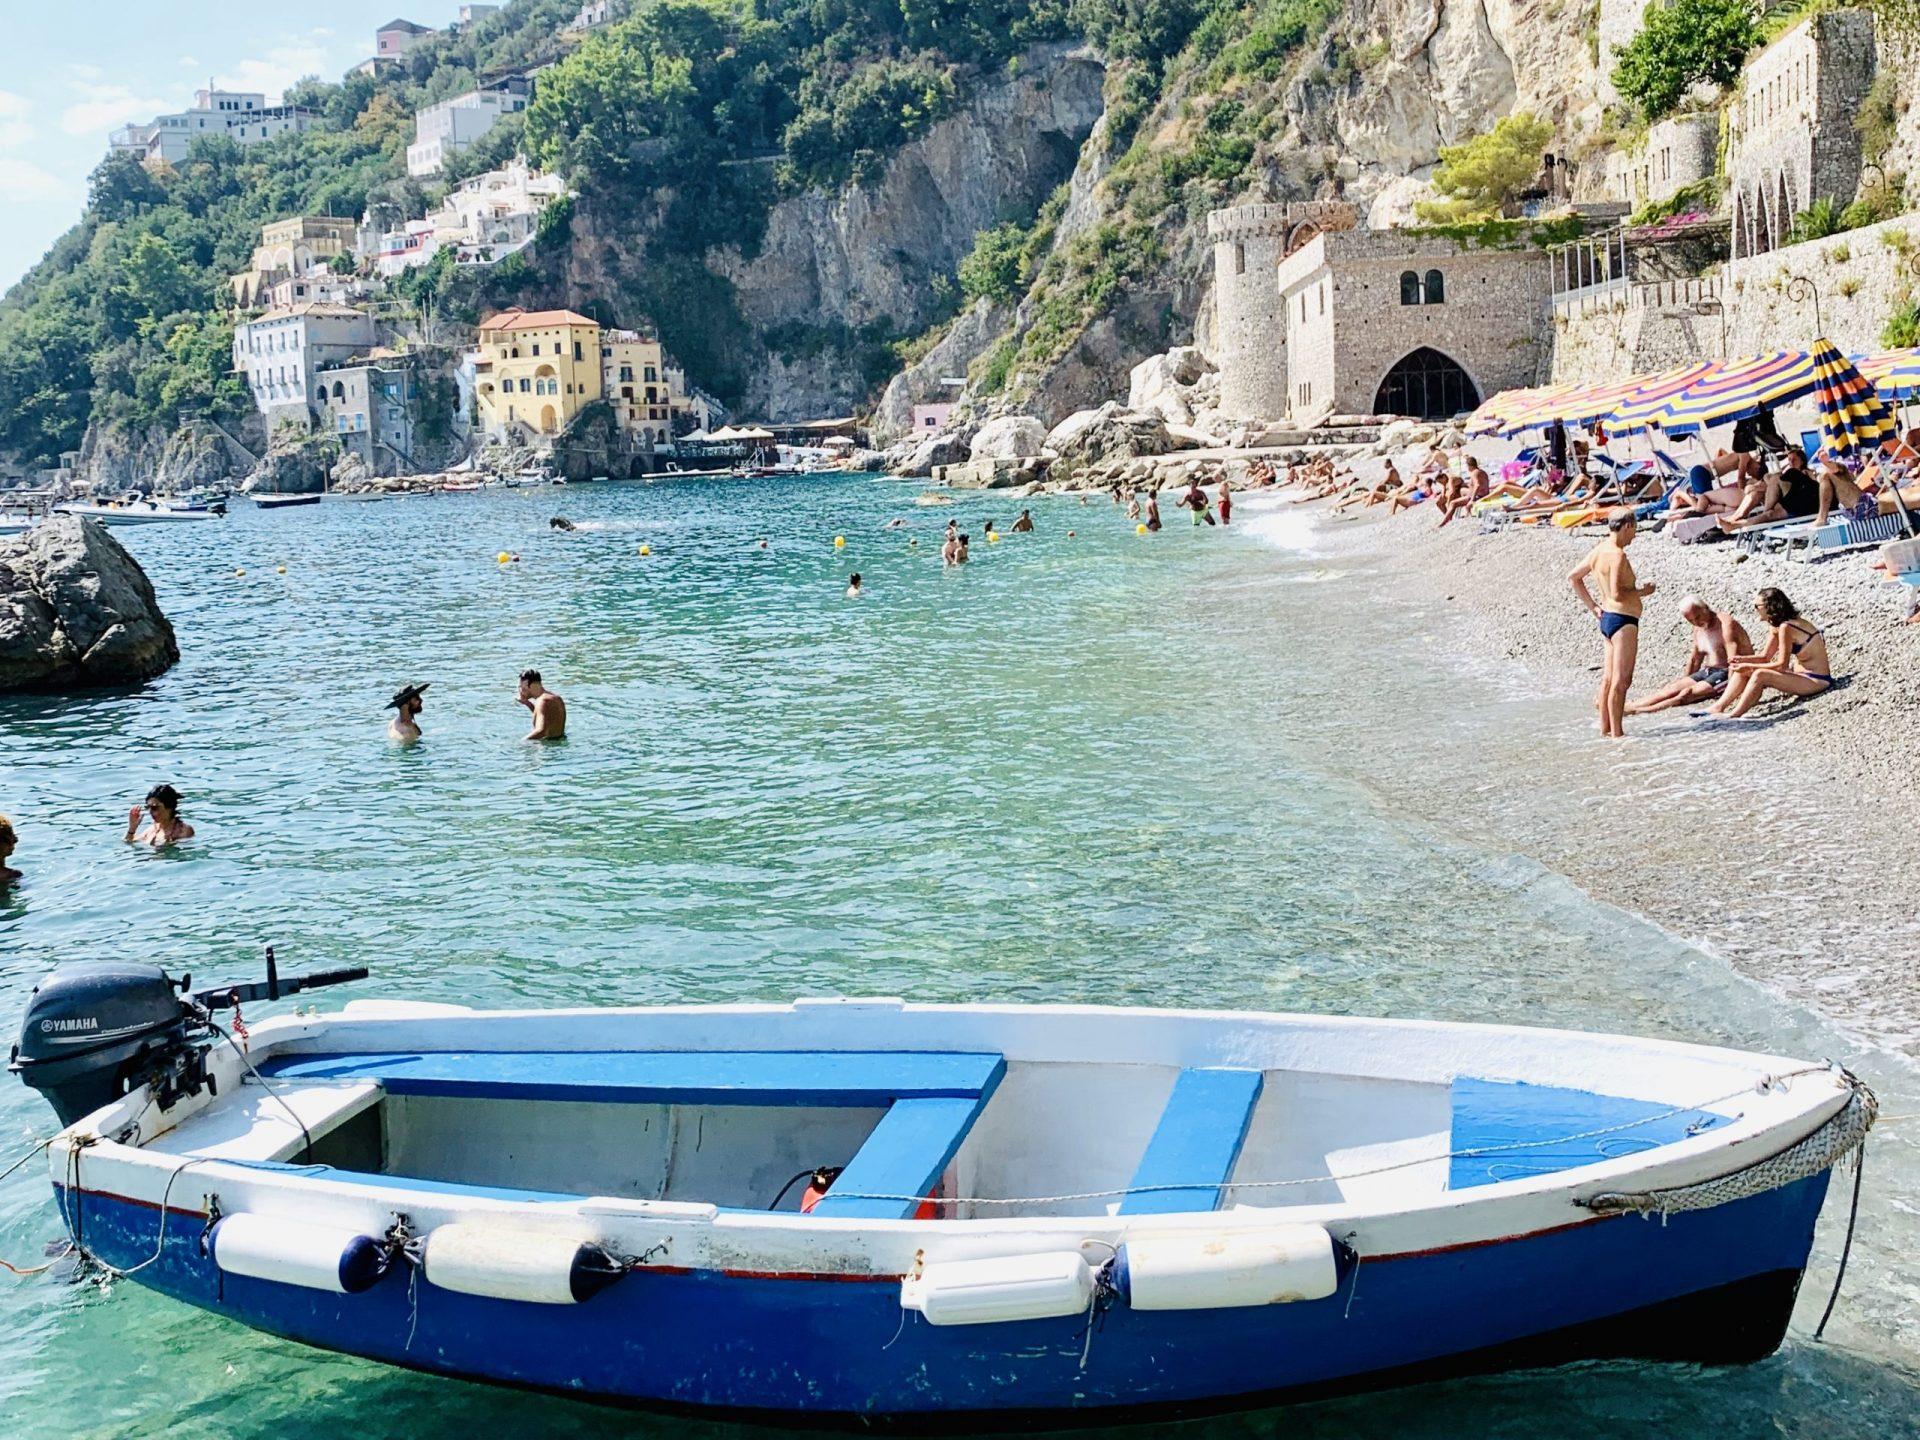 Beaches in Amalfi, Conca dei Marini